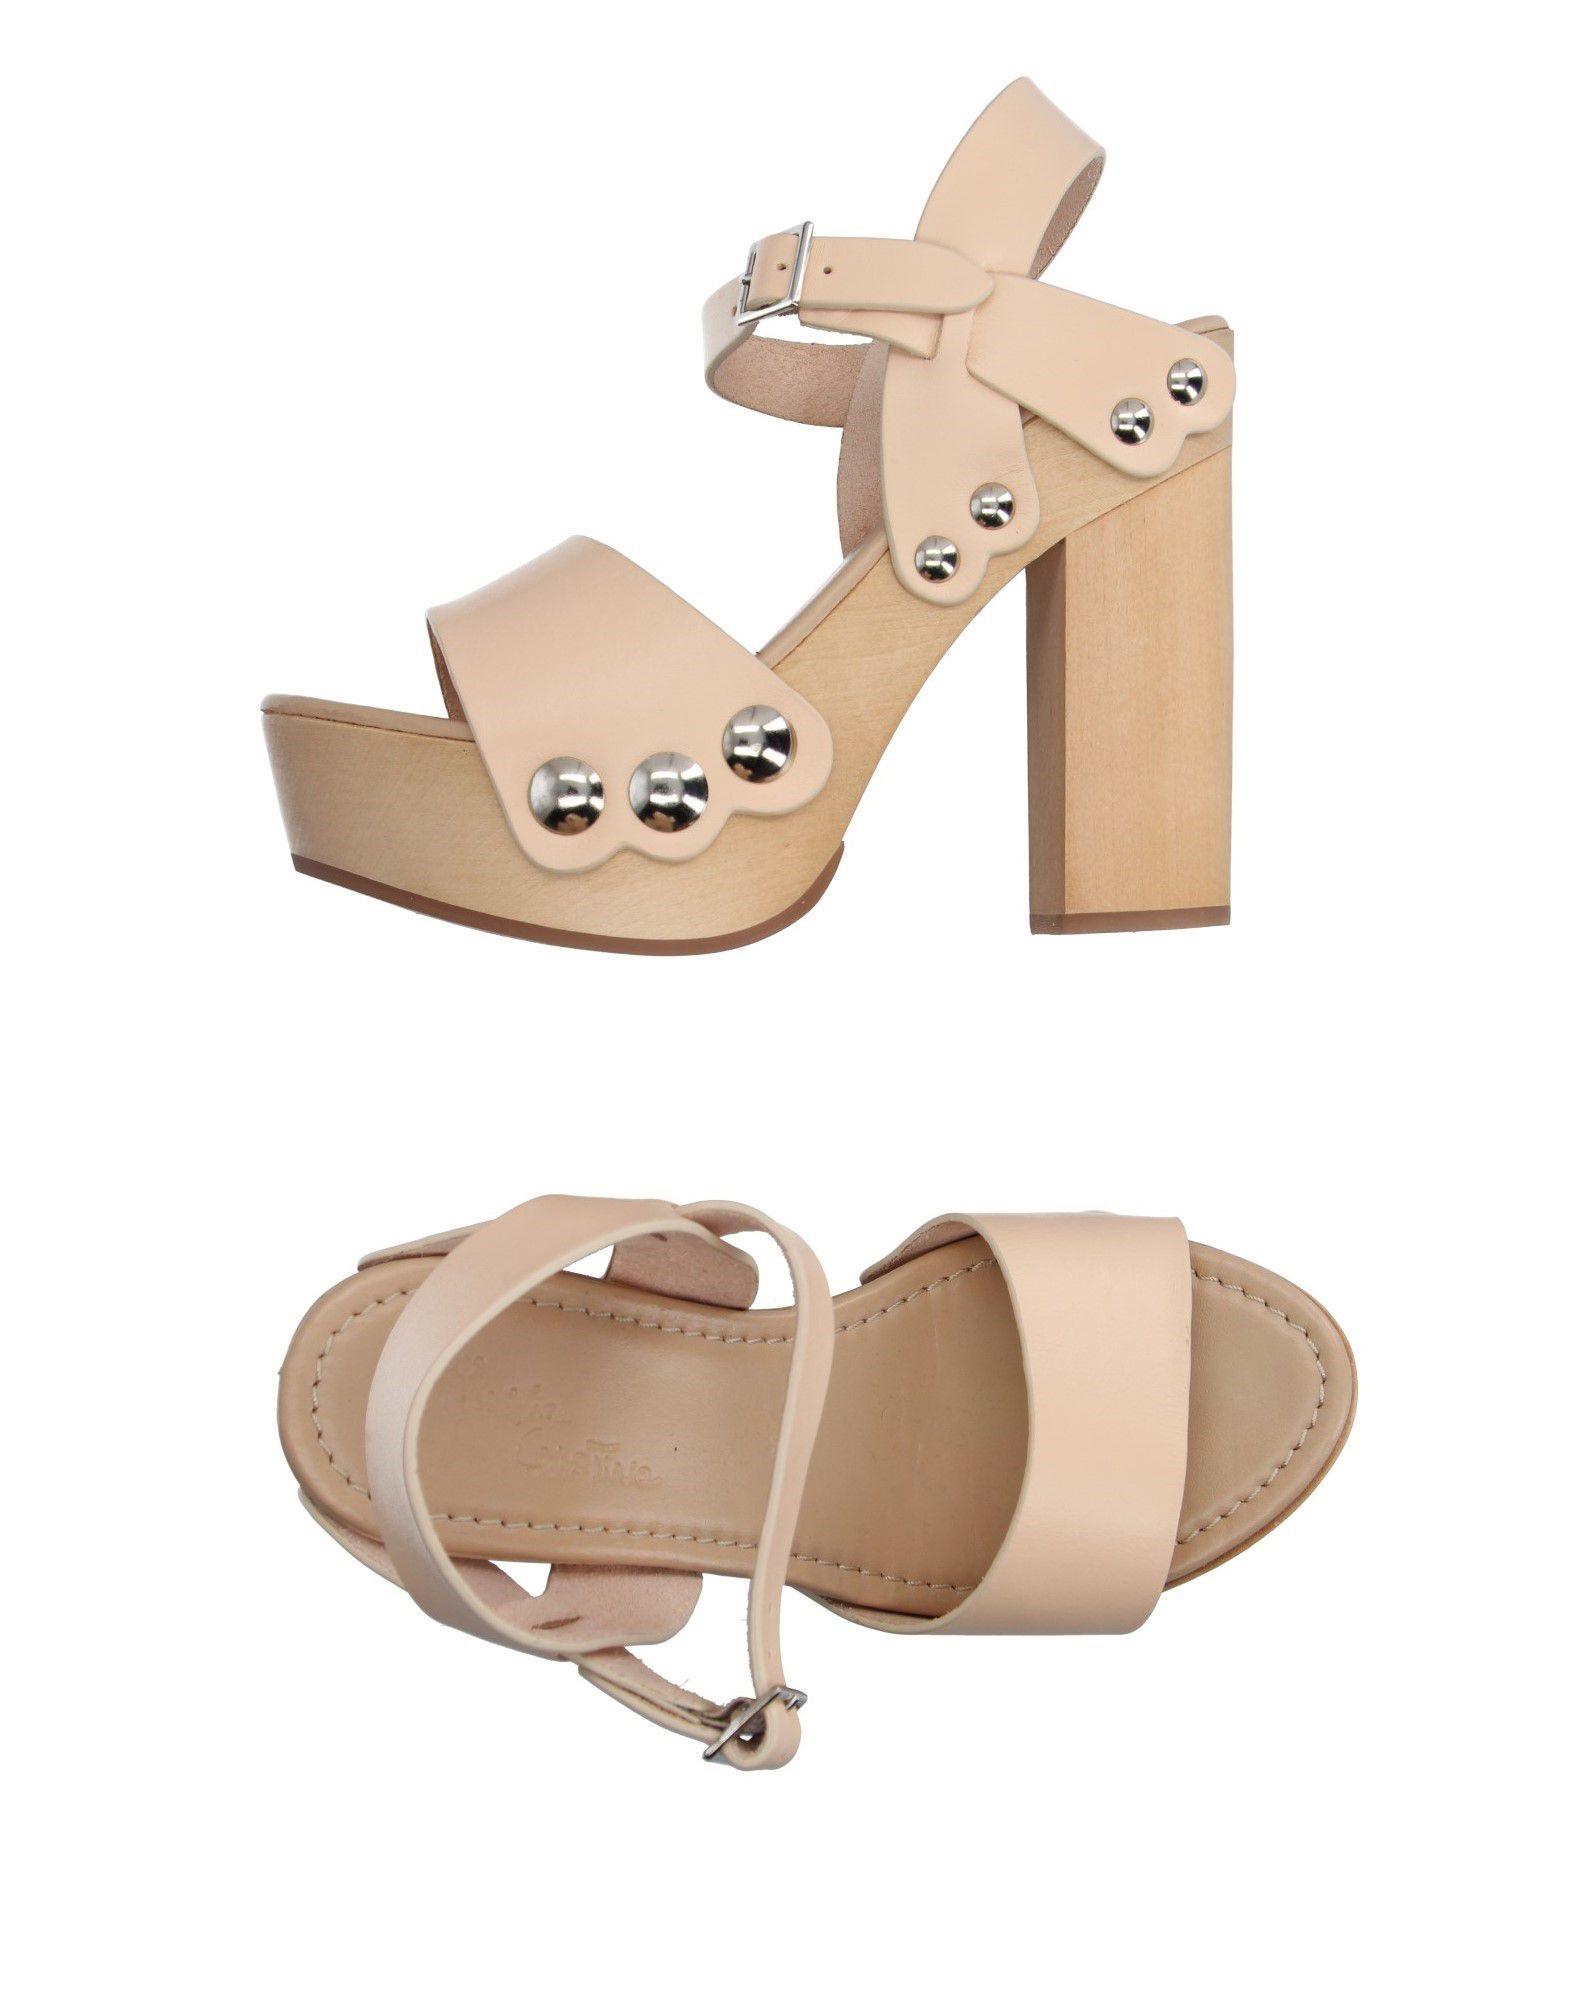 Maria Cristina Sandalen Damen  11134109HX Gute Qualität beliebte Schuhe